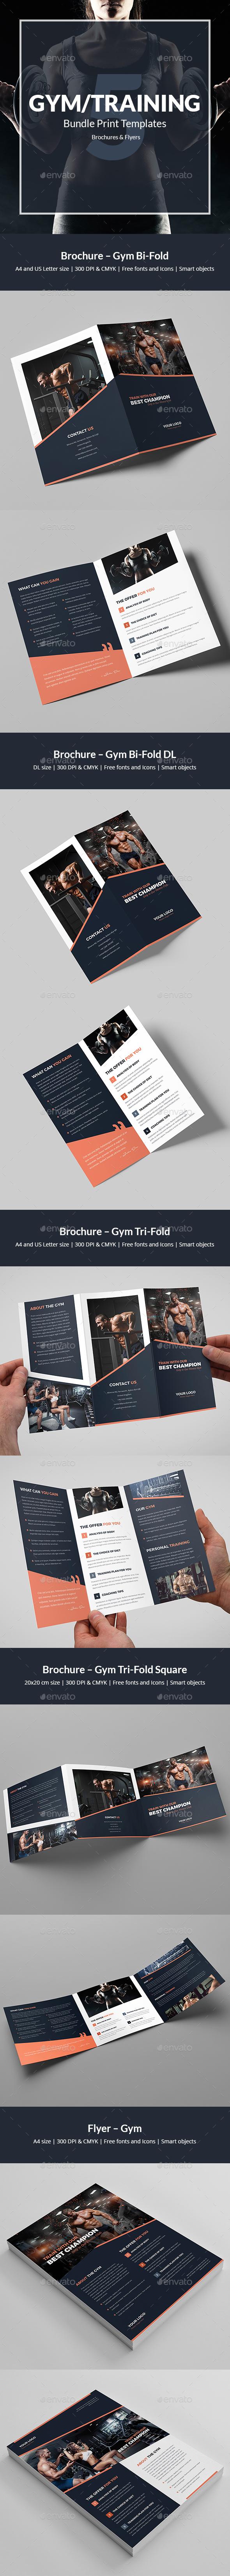 Gym – Bundle Print Templates 5 in 1 - Corporate Brochures